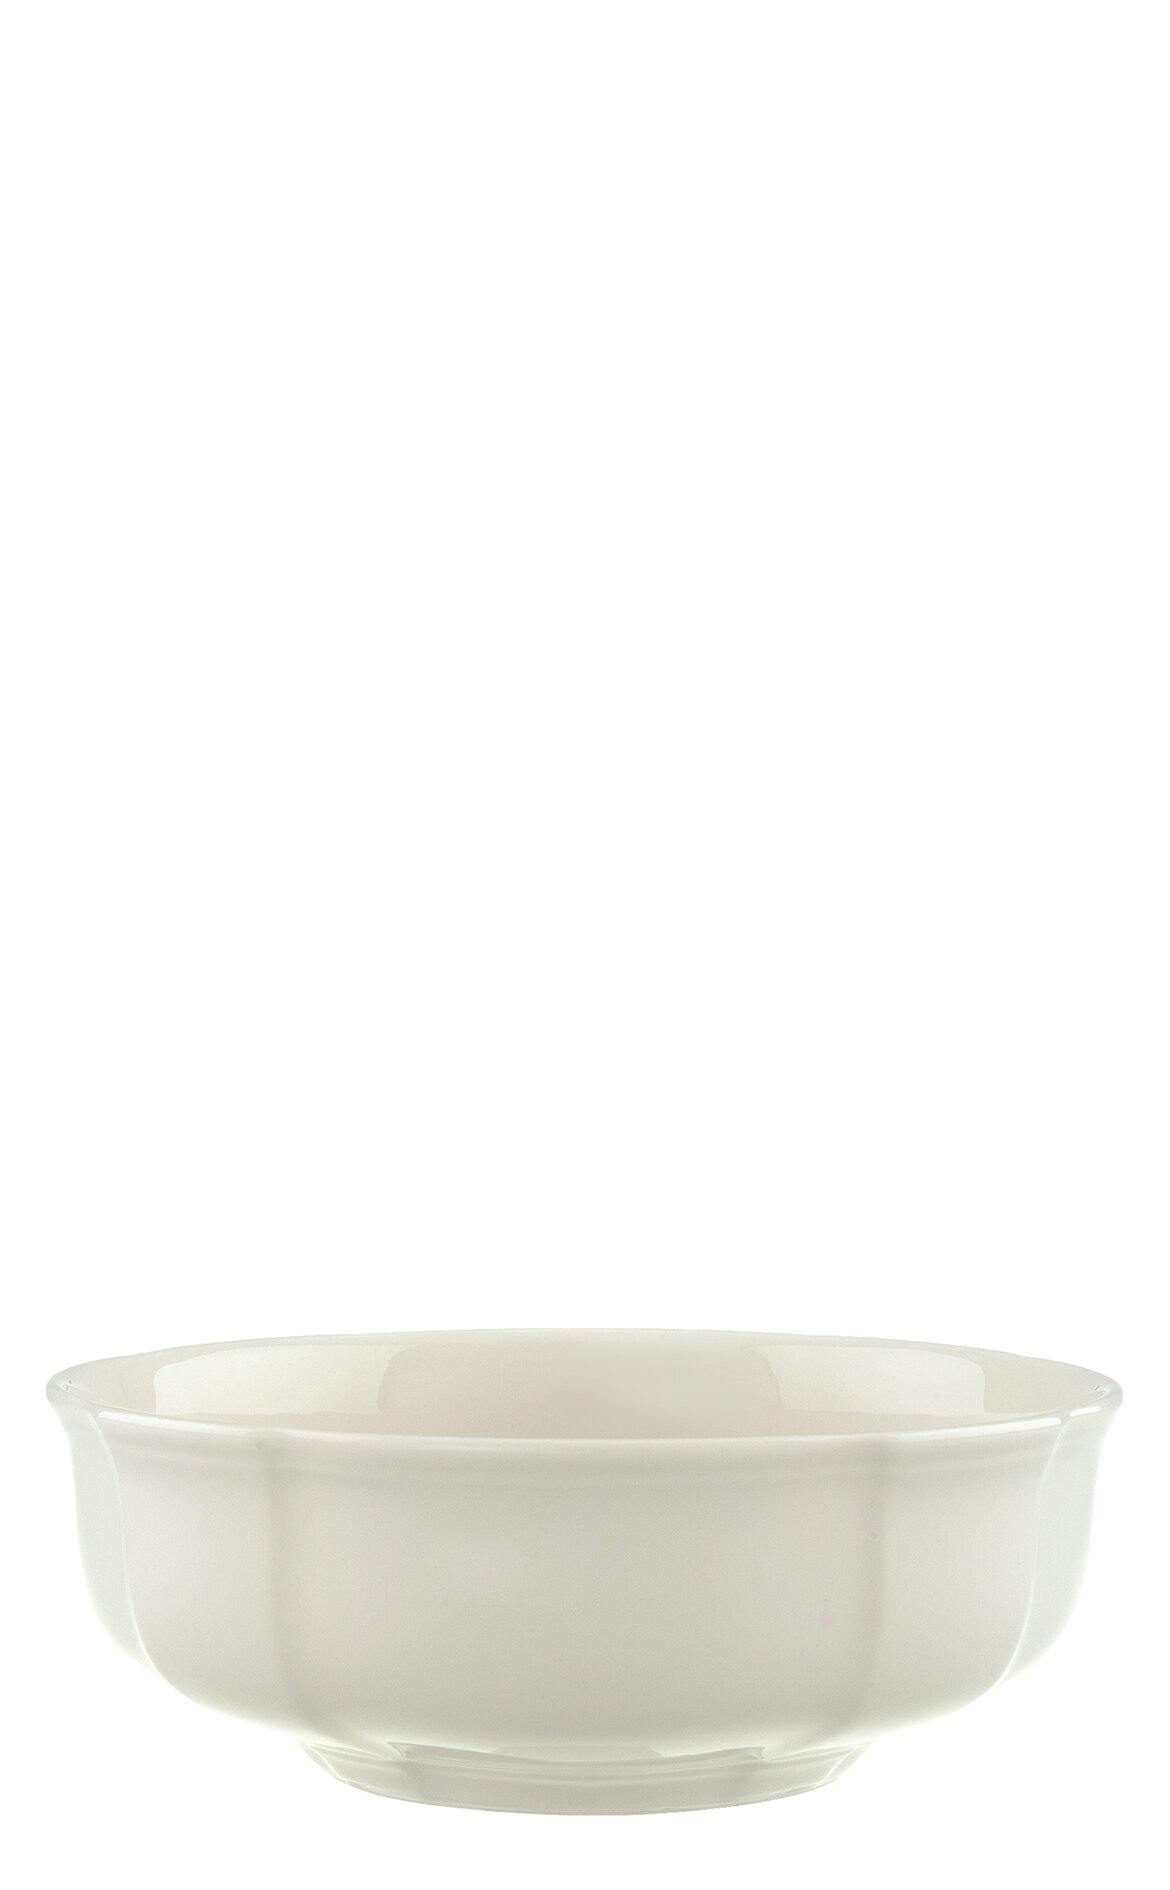 Villeroy & Boch Manoir Salata Kasesi, 15 cm.